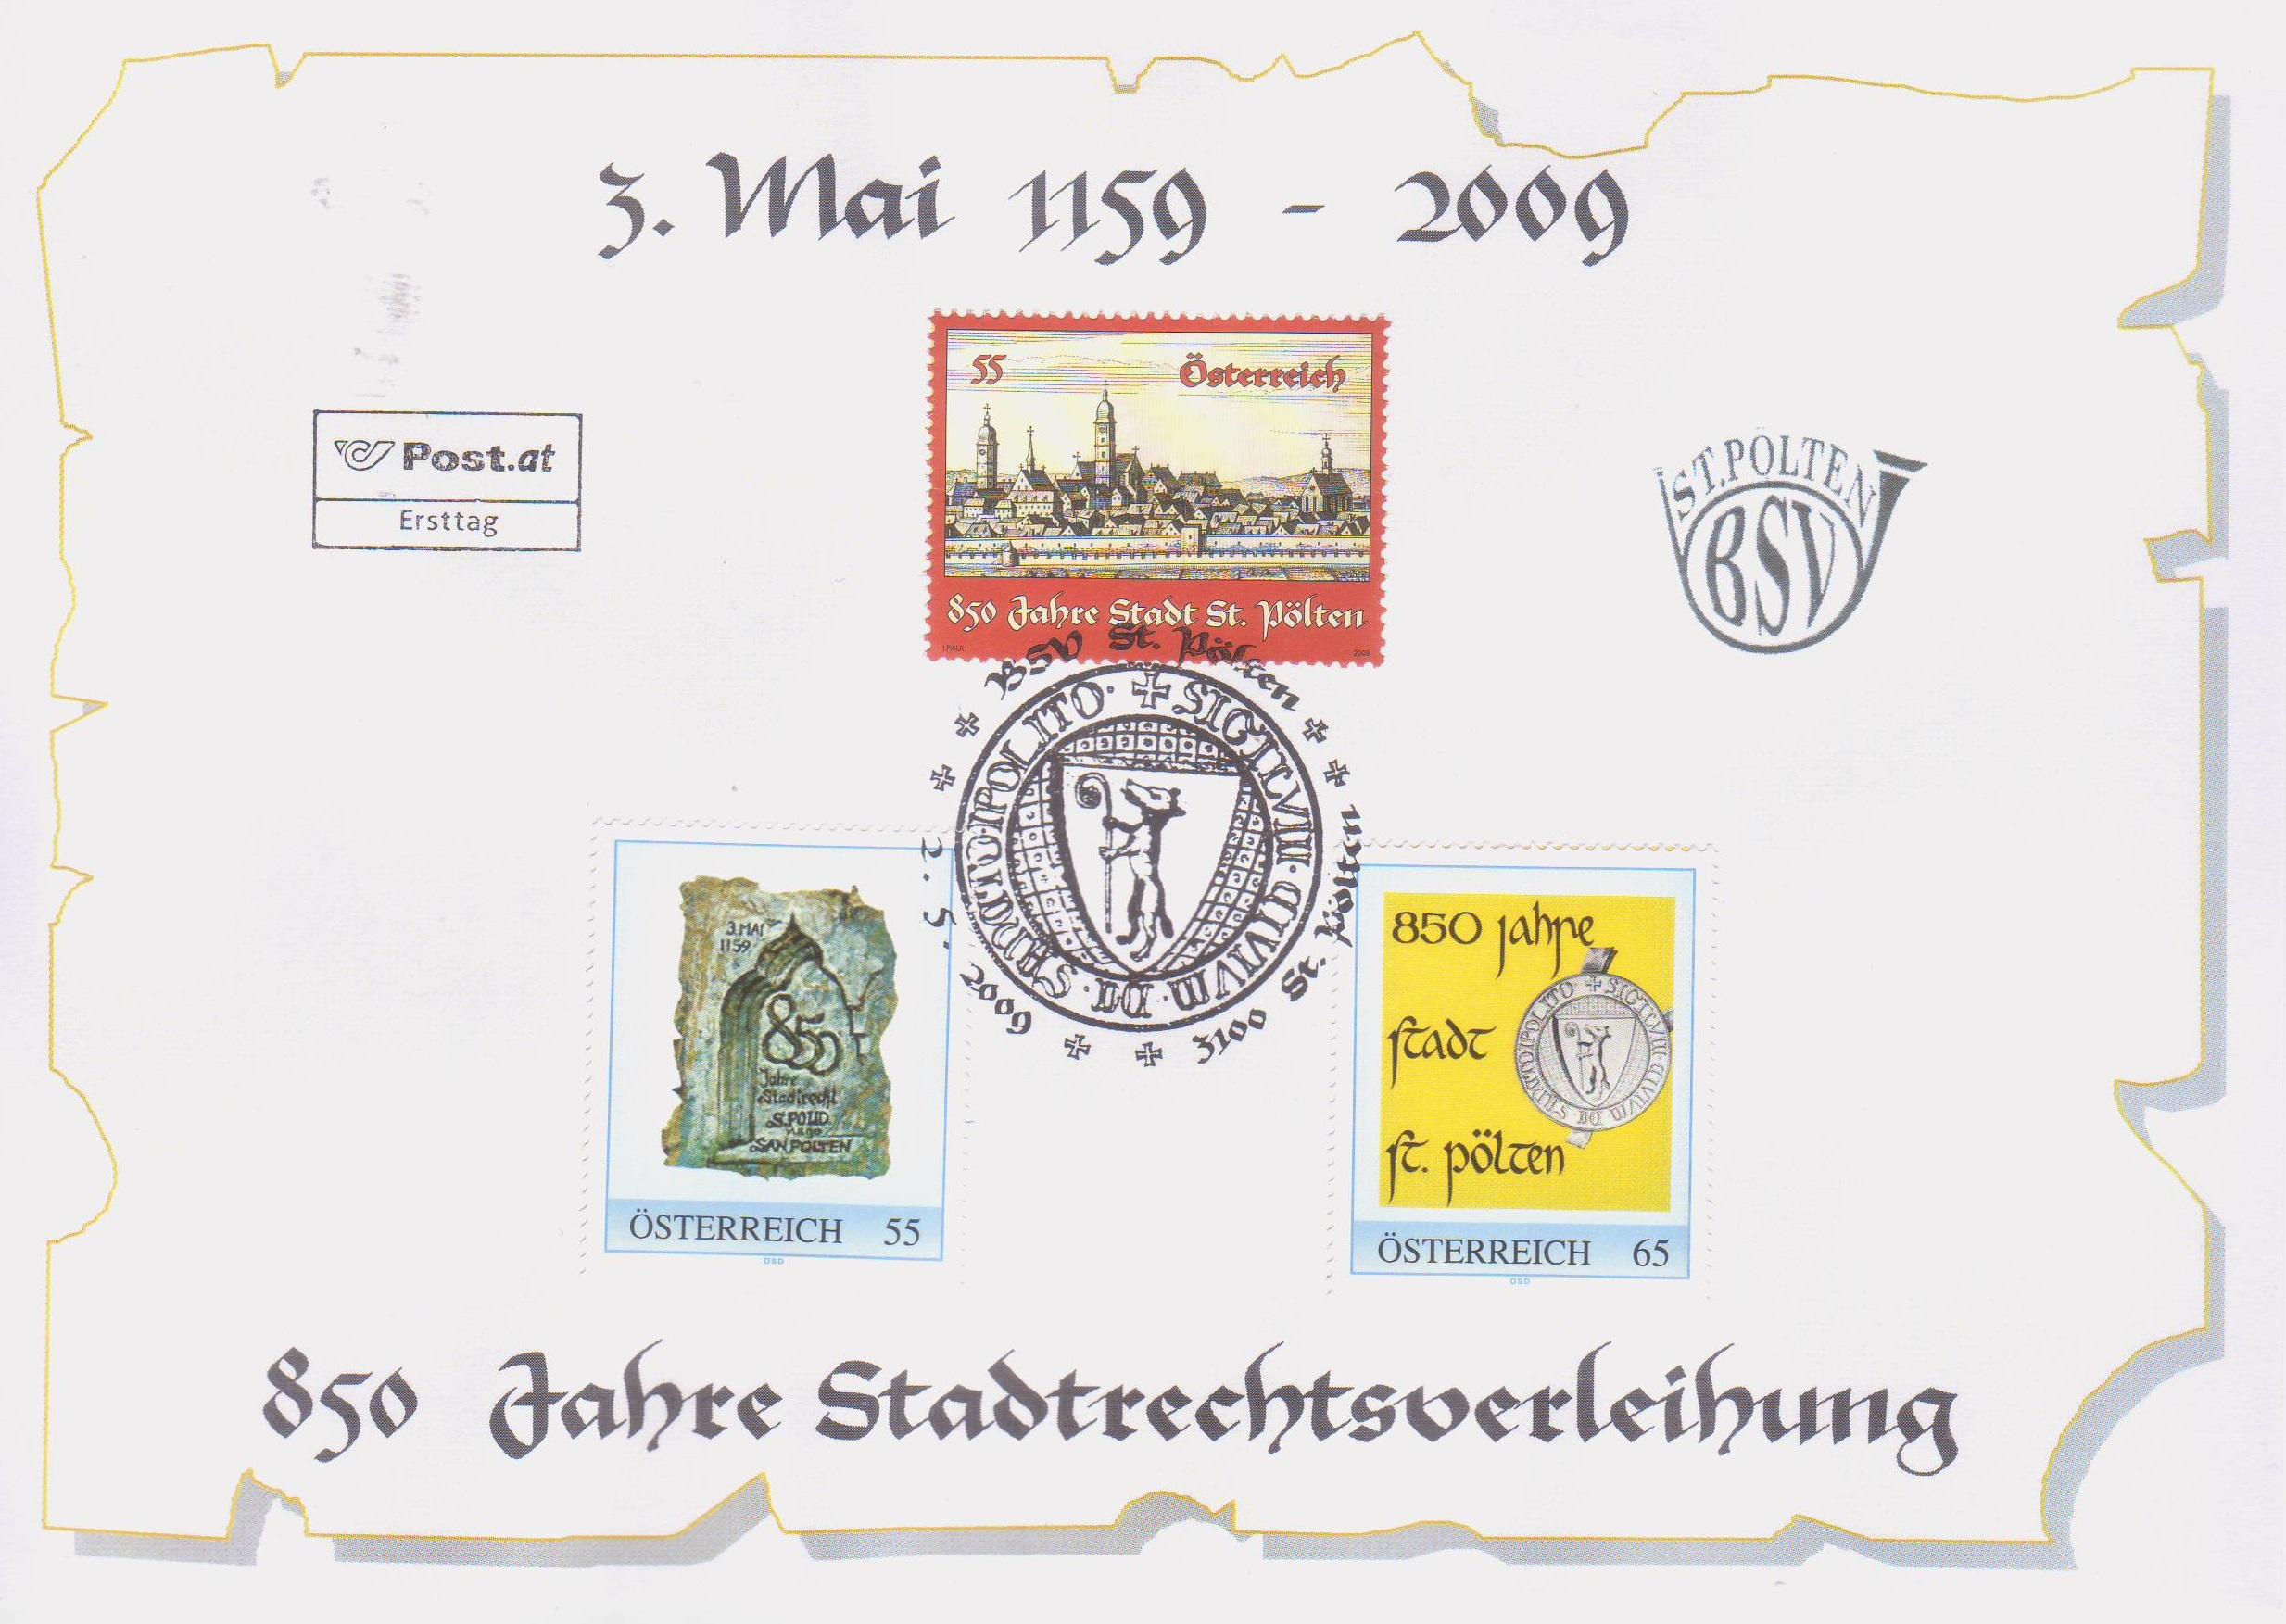 2009 7.-EUR 850 Jahre Stadtrecht